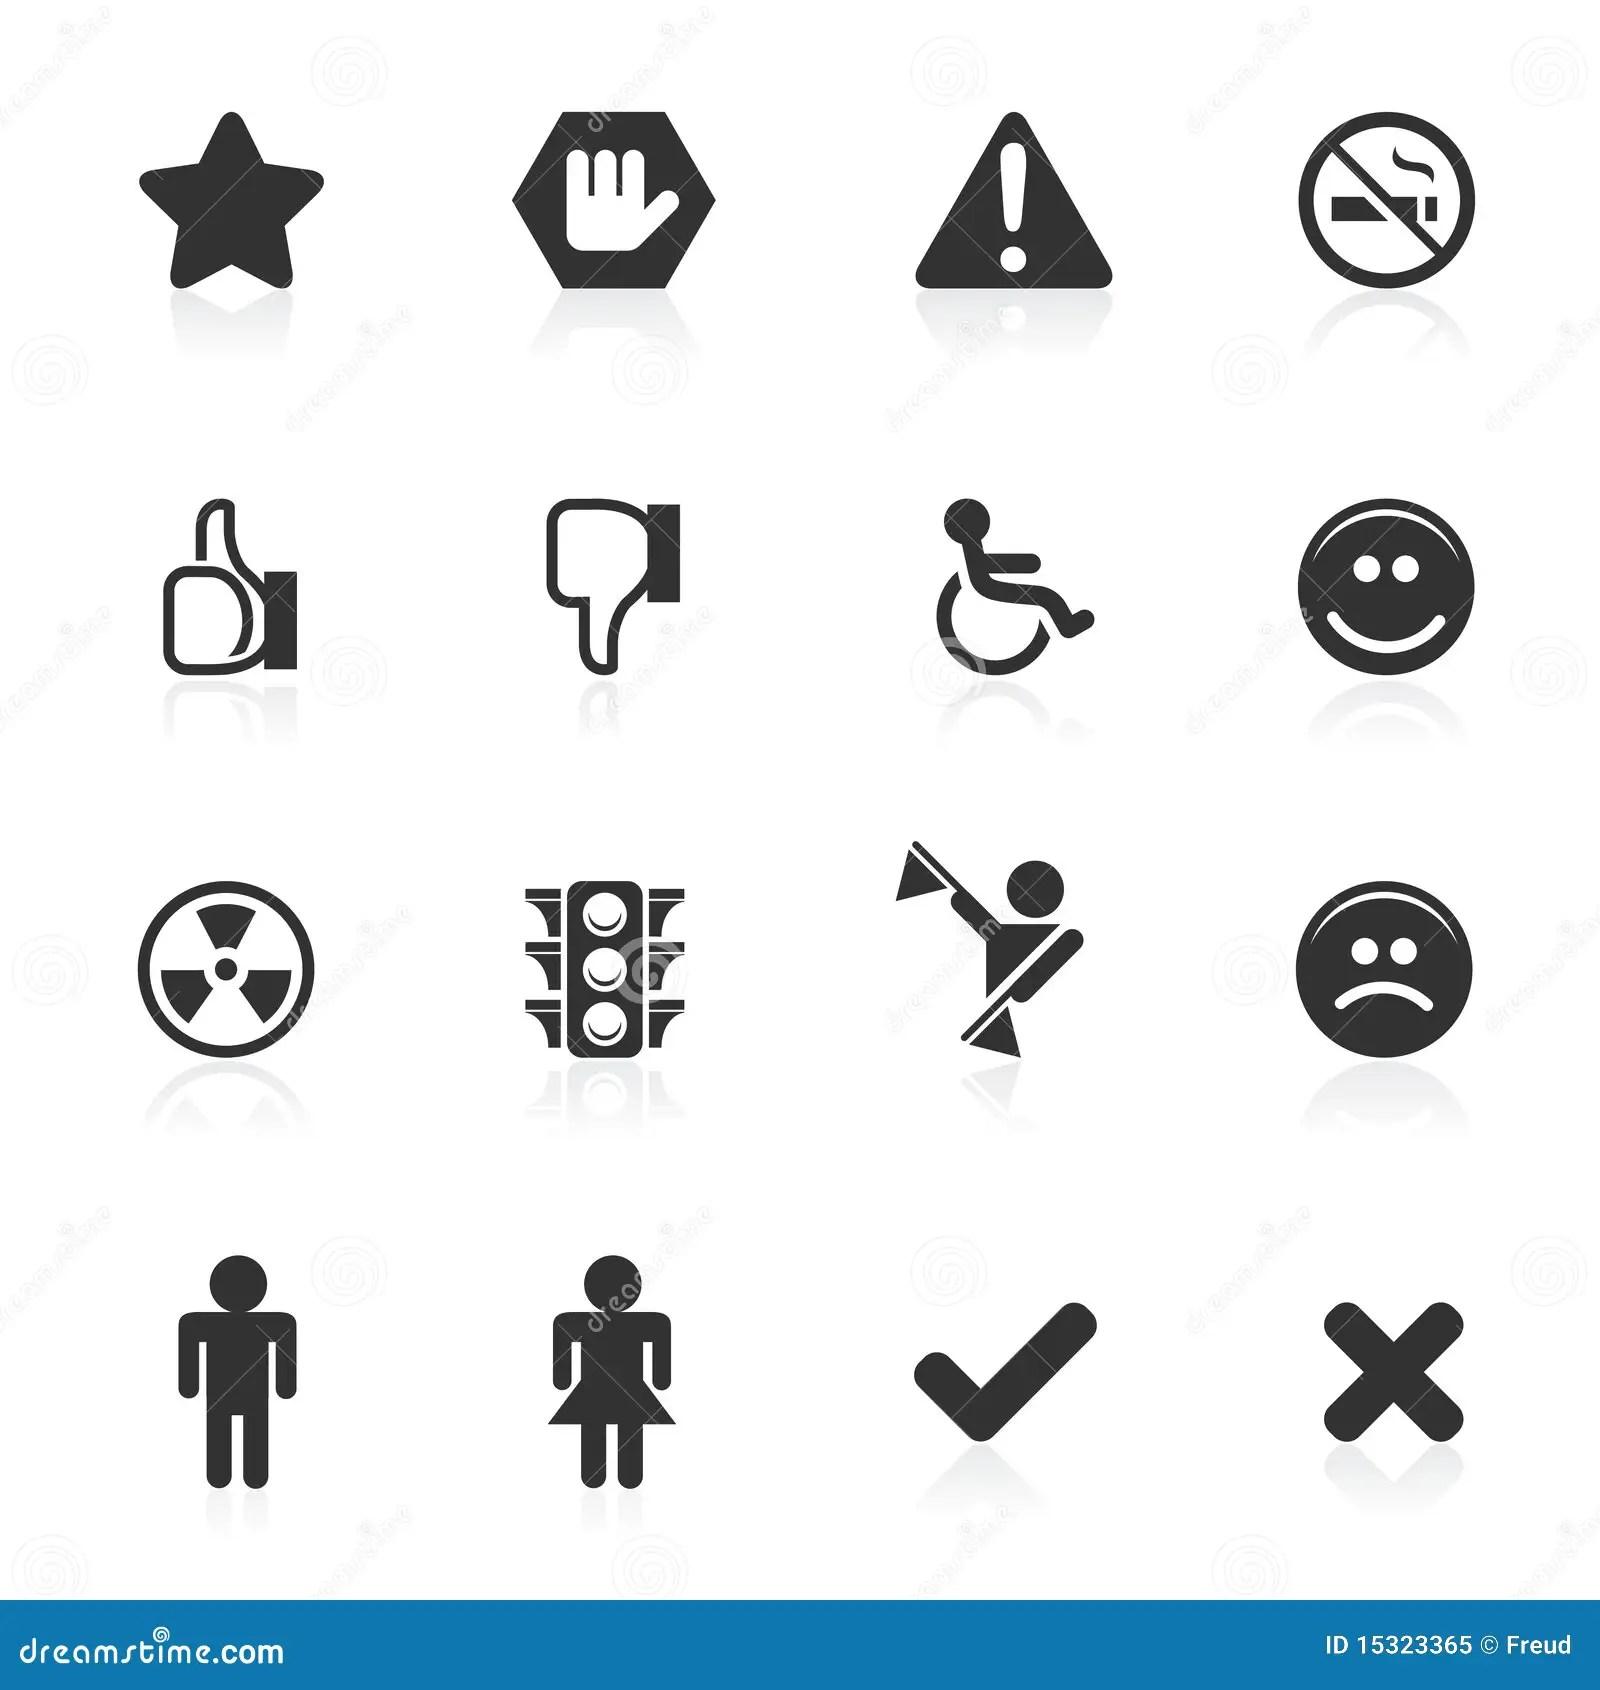 Signs Amp Symbols Icons